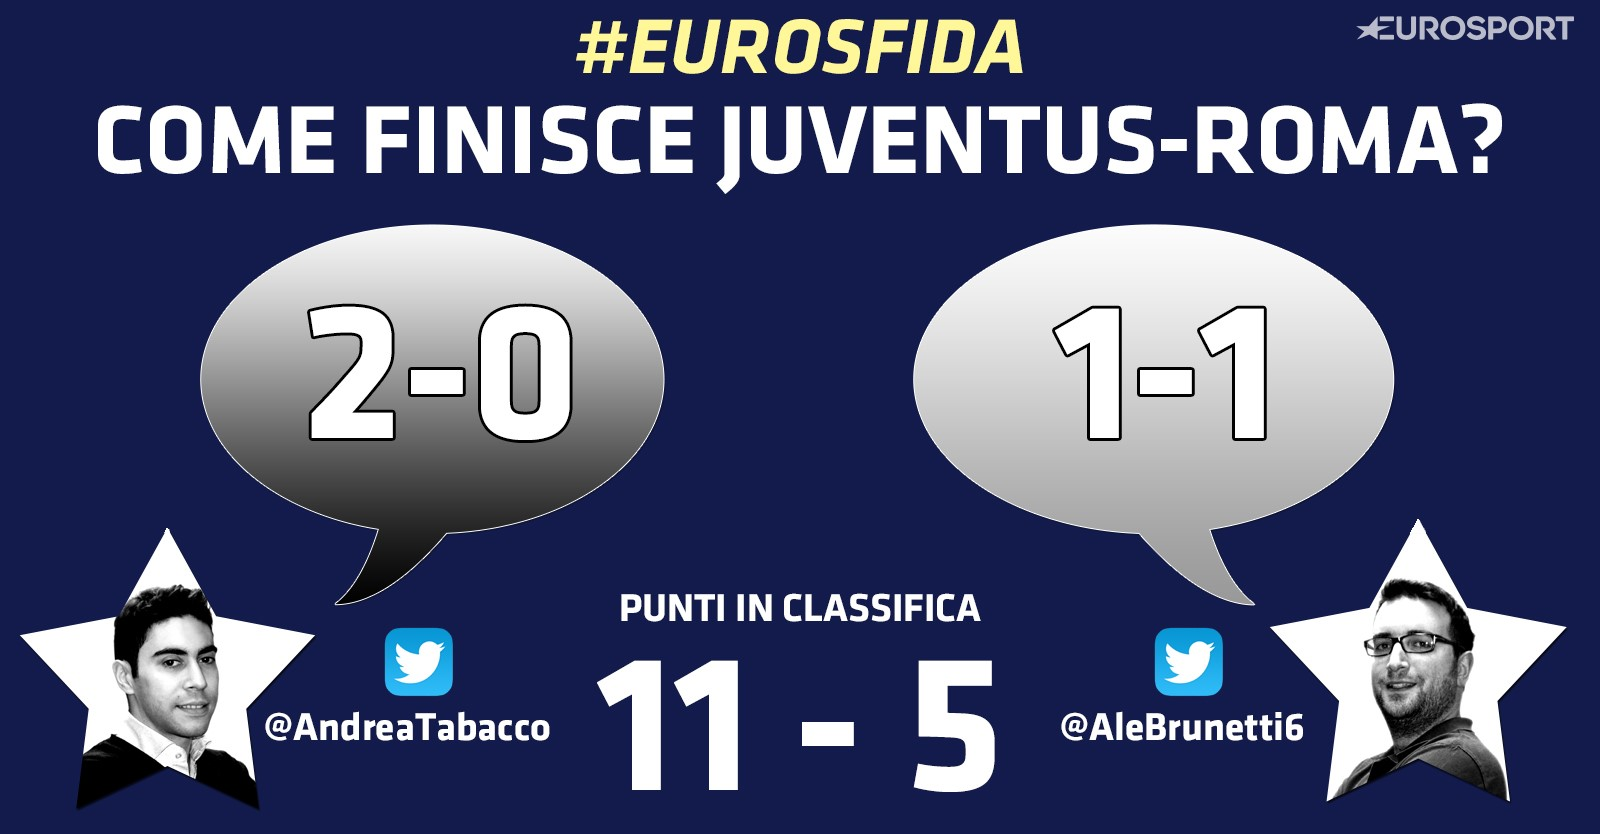 Gonzalo Higuain spiega l'esultanza contro la Juventus a Doha